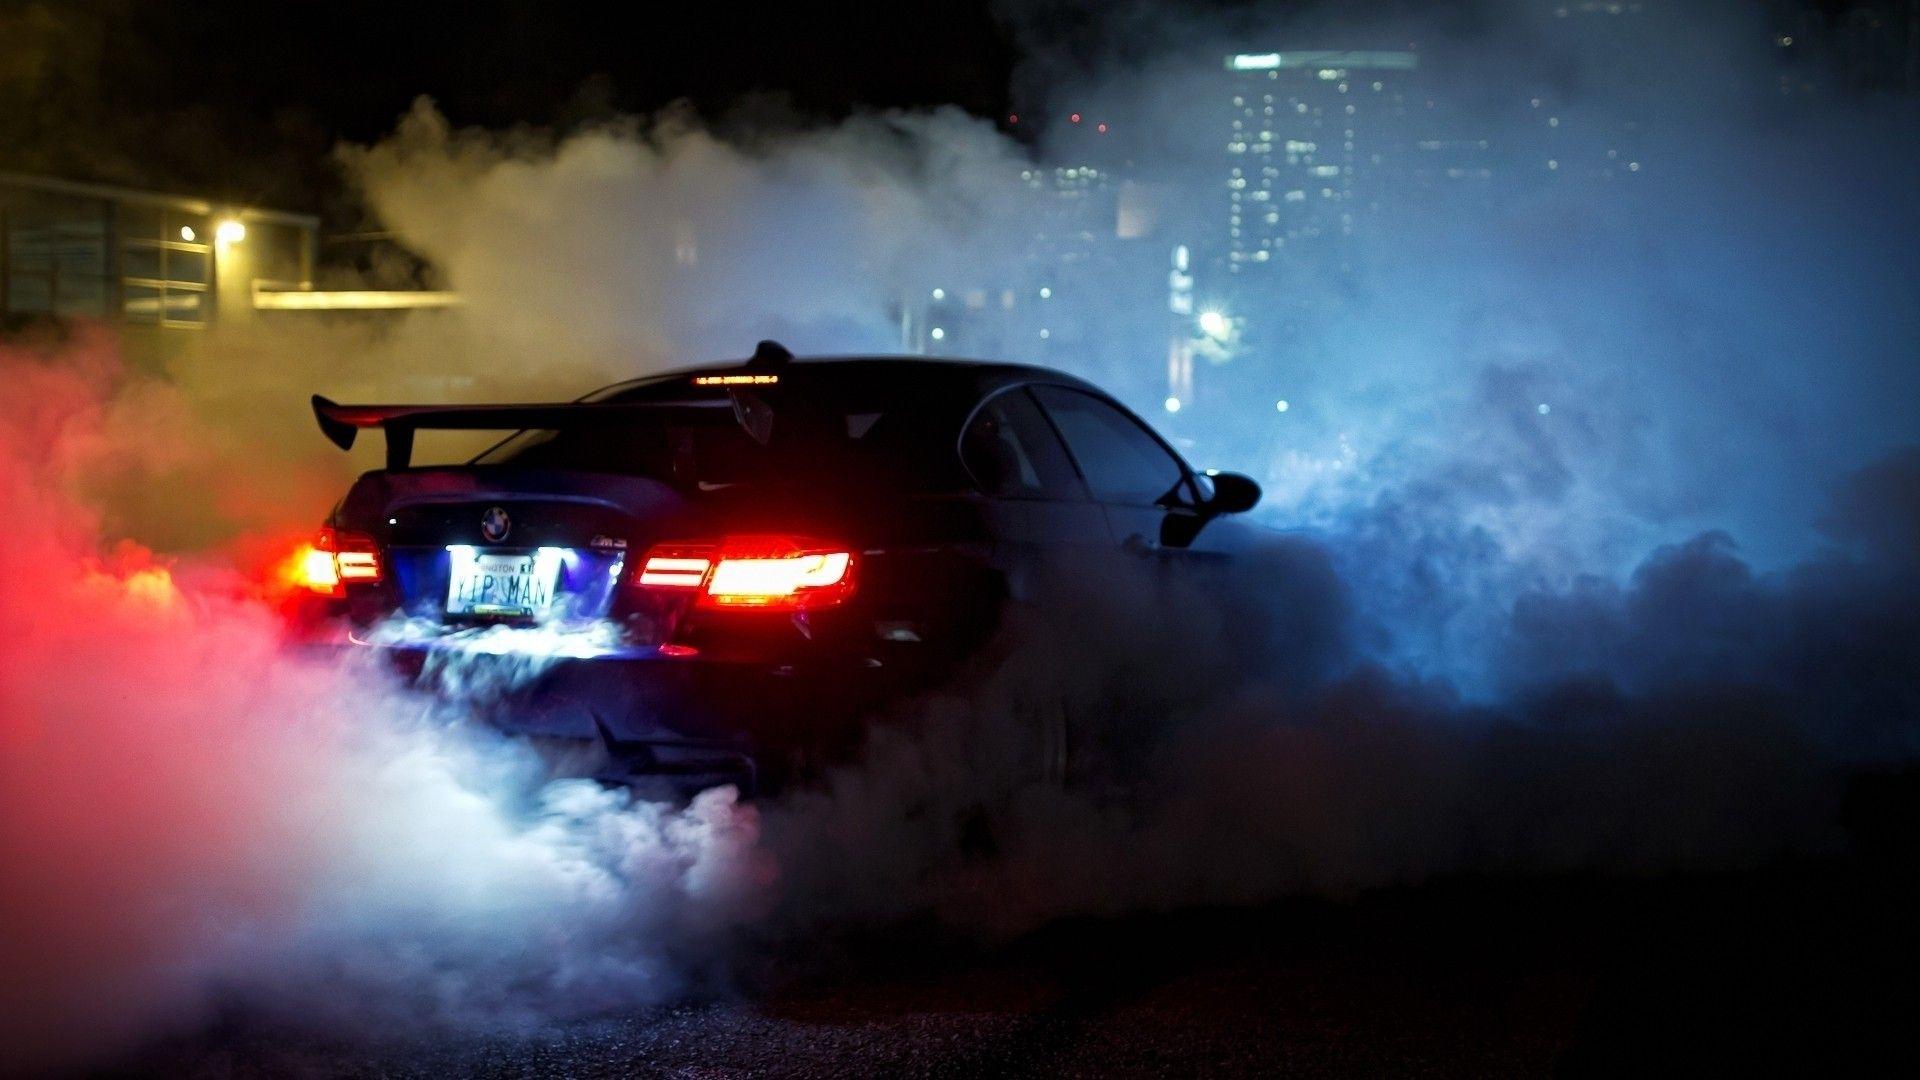 Bmw M3 Bmw Cars Night Smoke Wallpaper Mauvq4hy6r | Cars ...